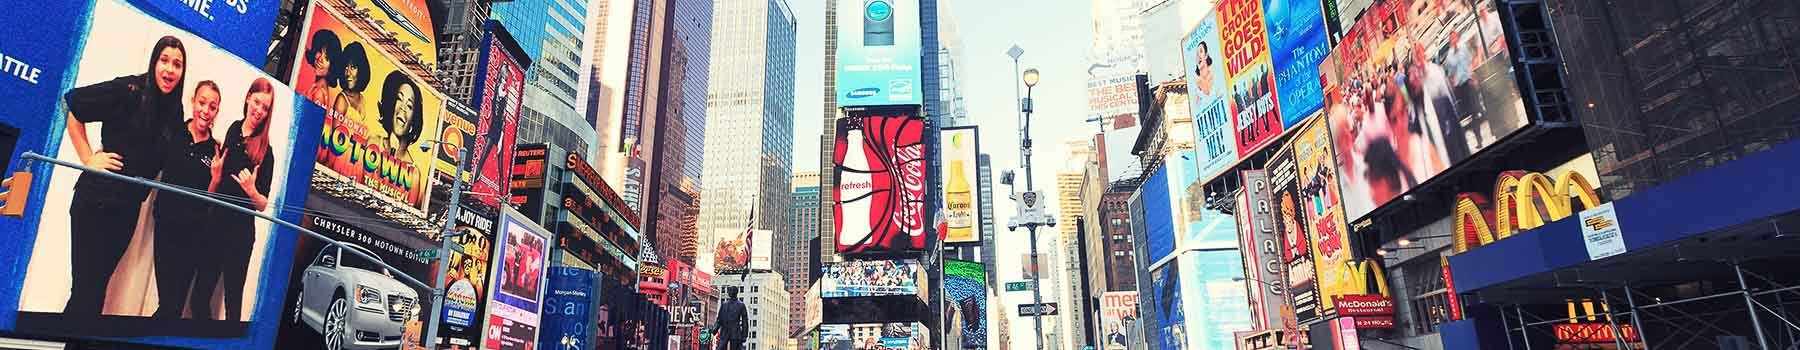 WJ Hotel - New York